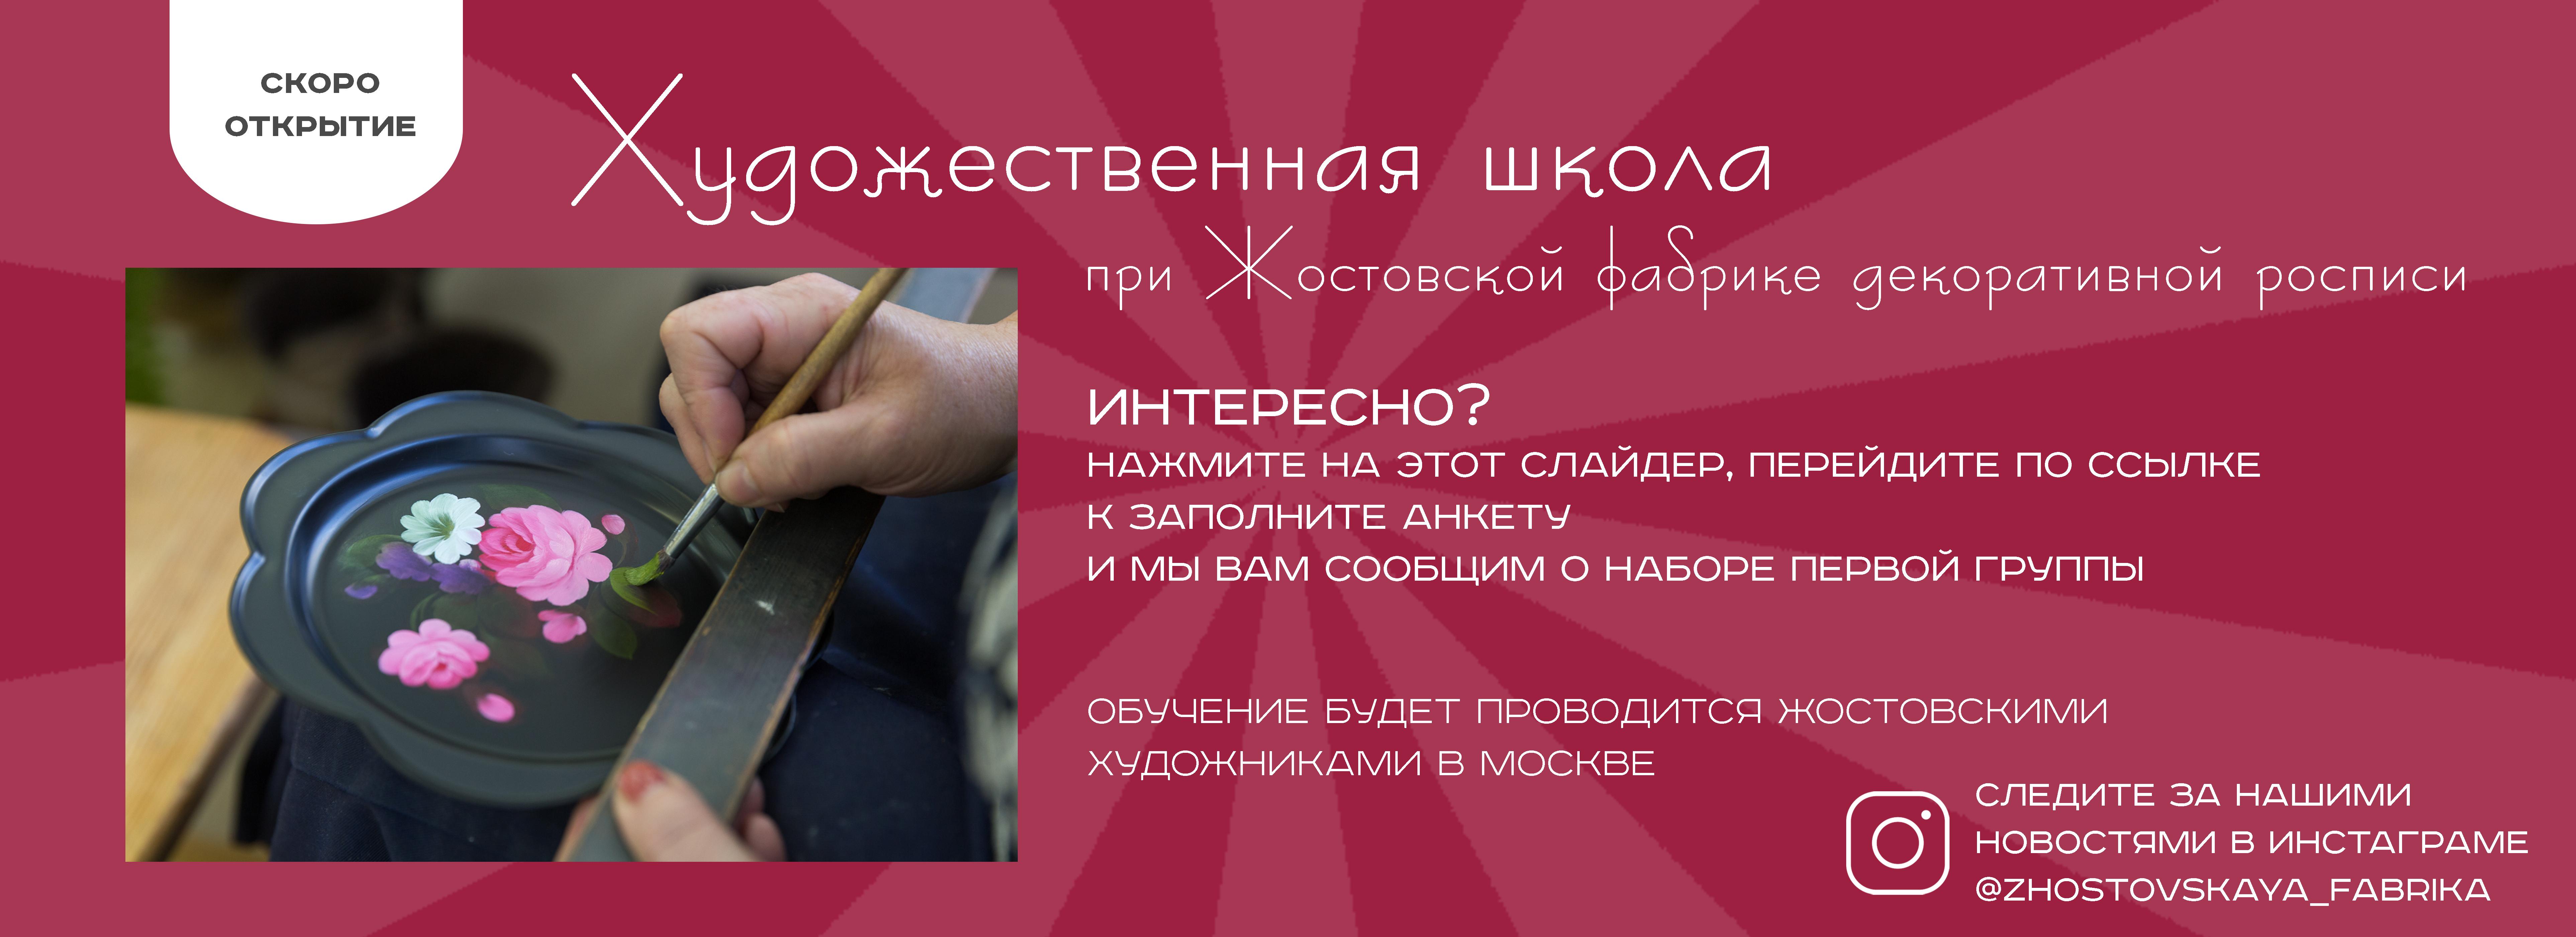 Слайдер_худ_студия.jpg